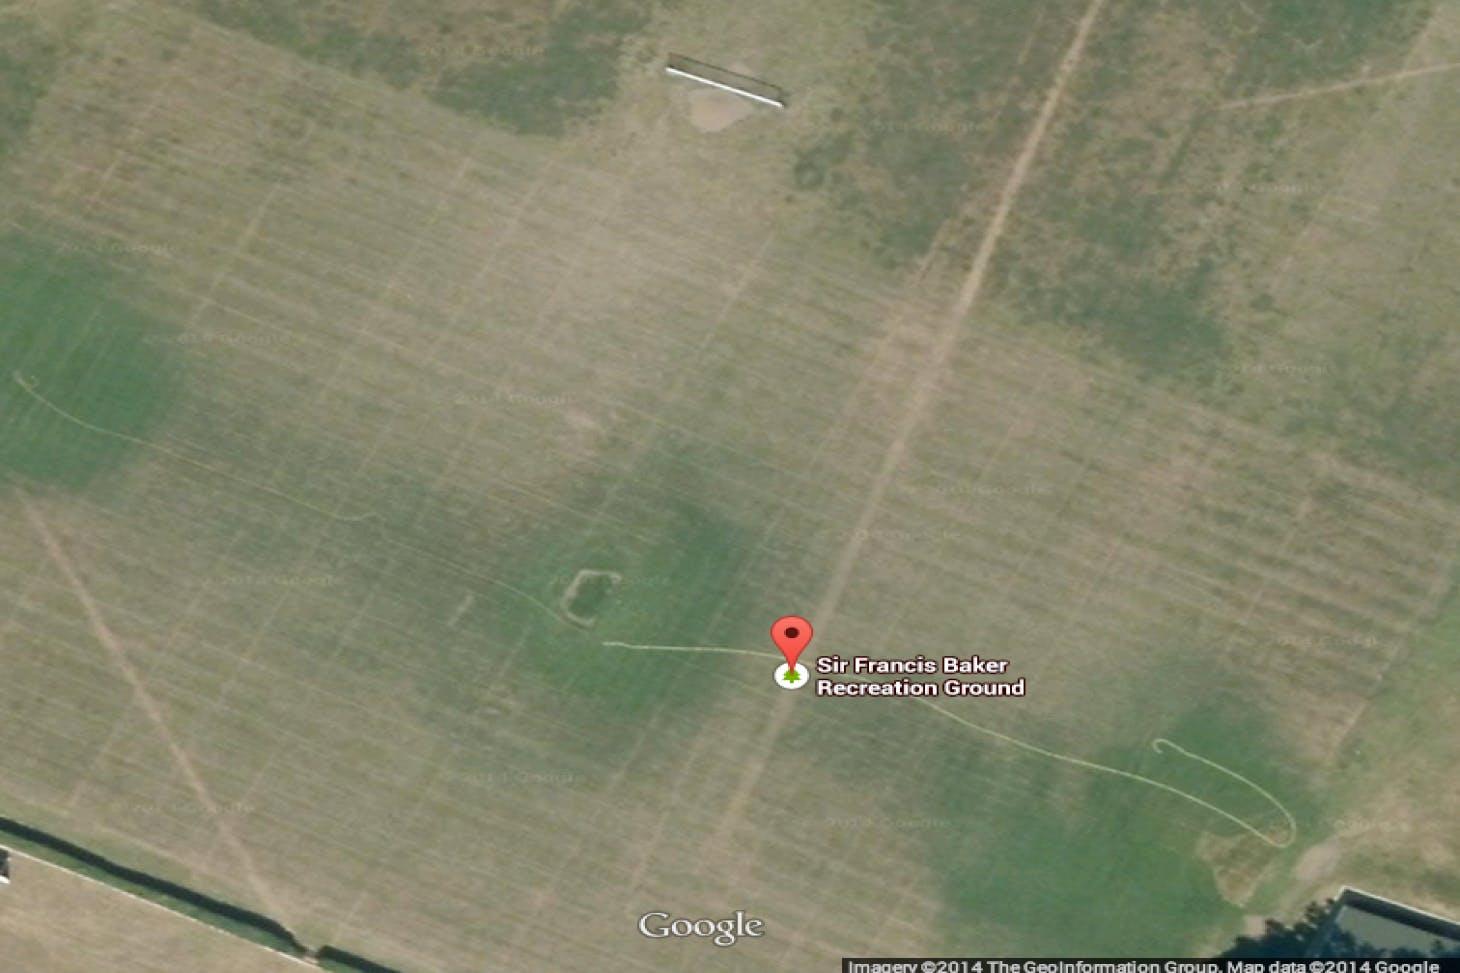 Sir Francis Barker Recreation Ground 11 a side | Grass football pitch